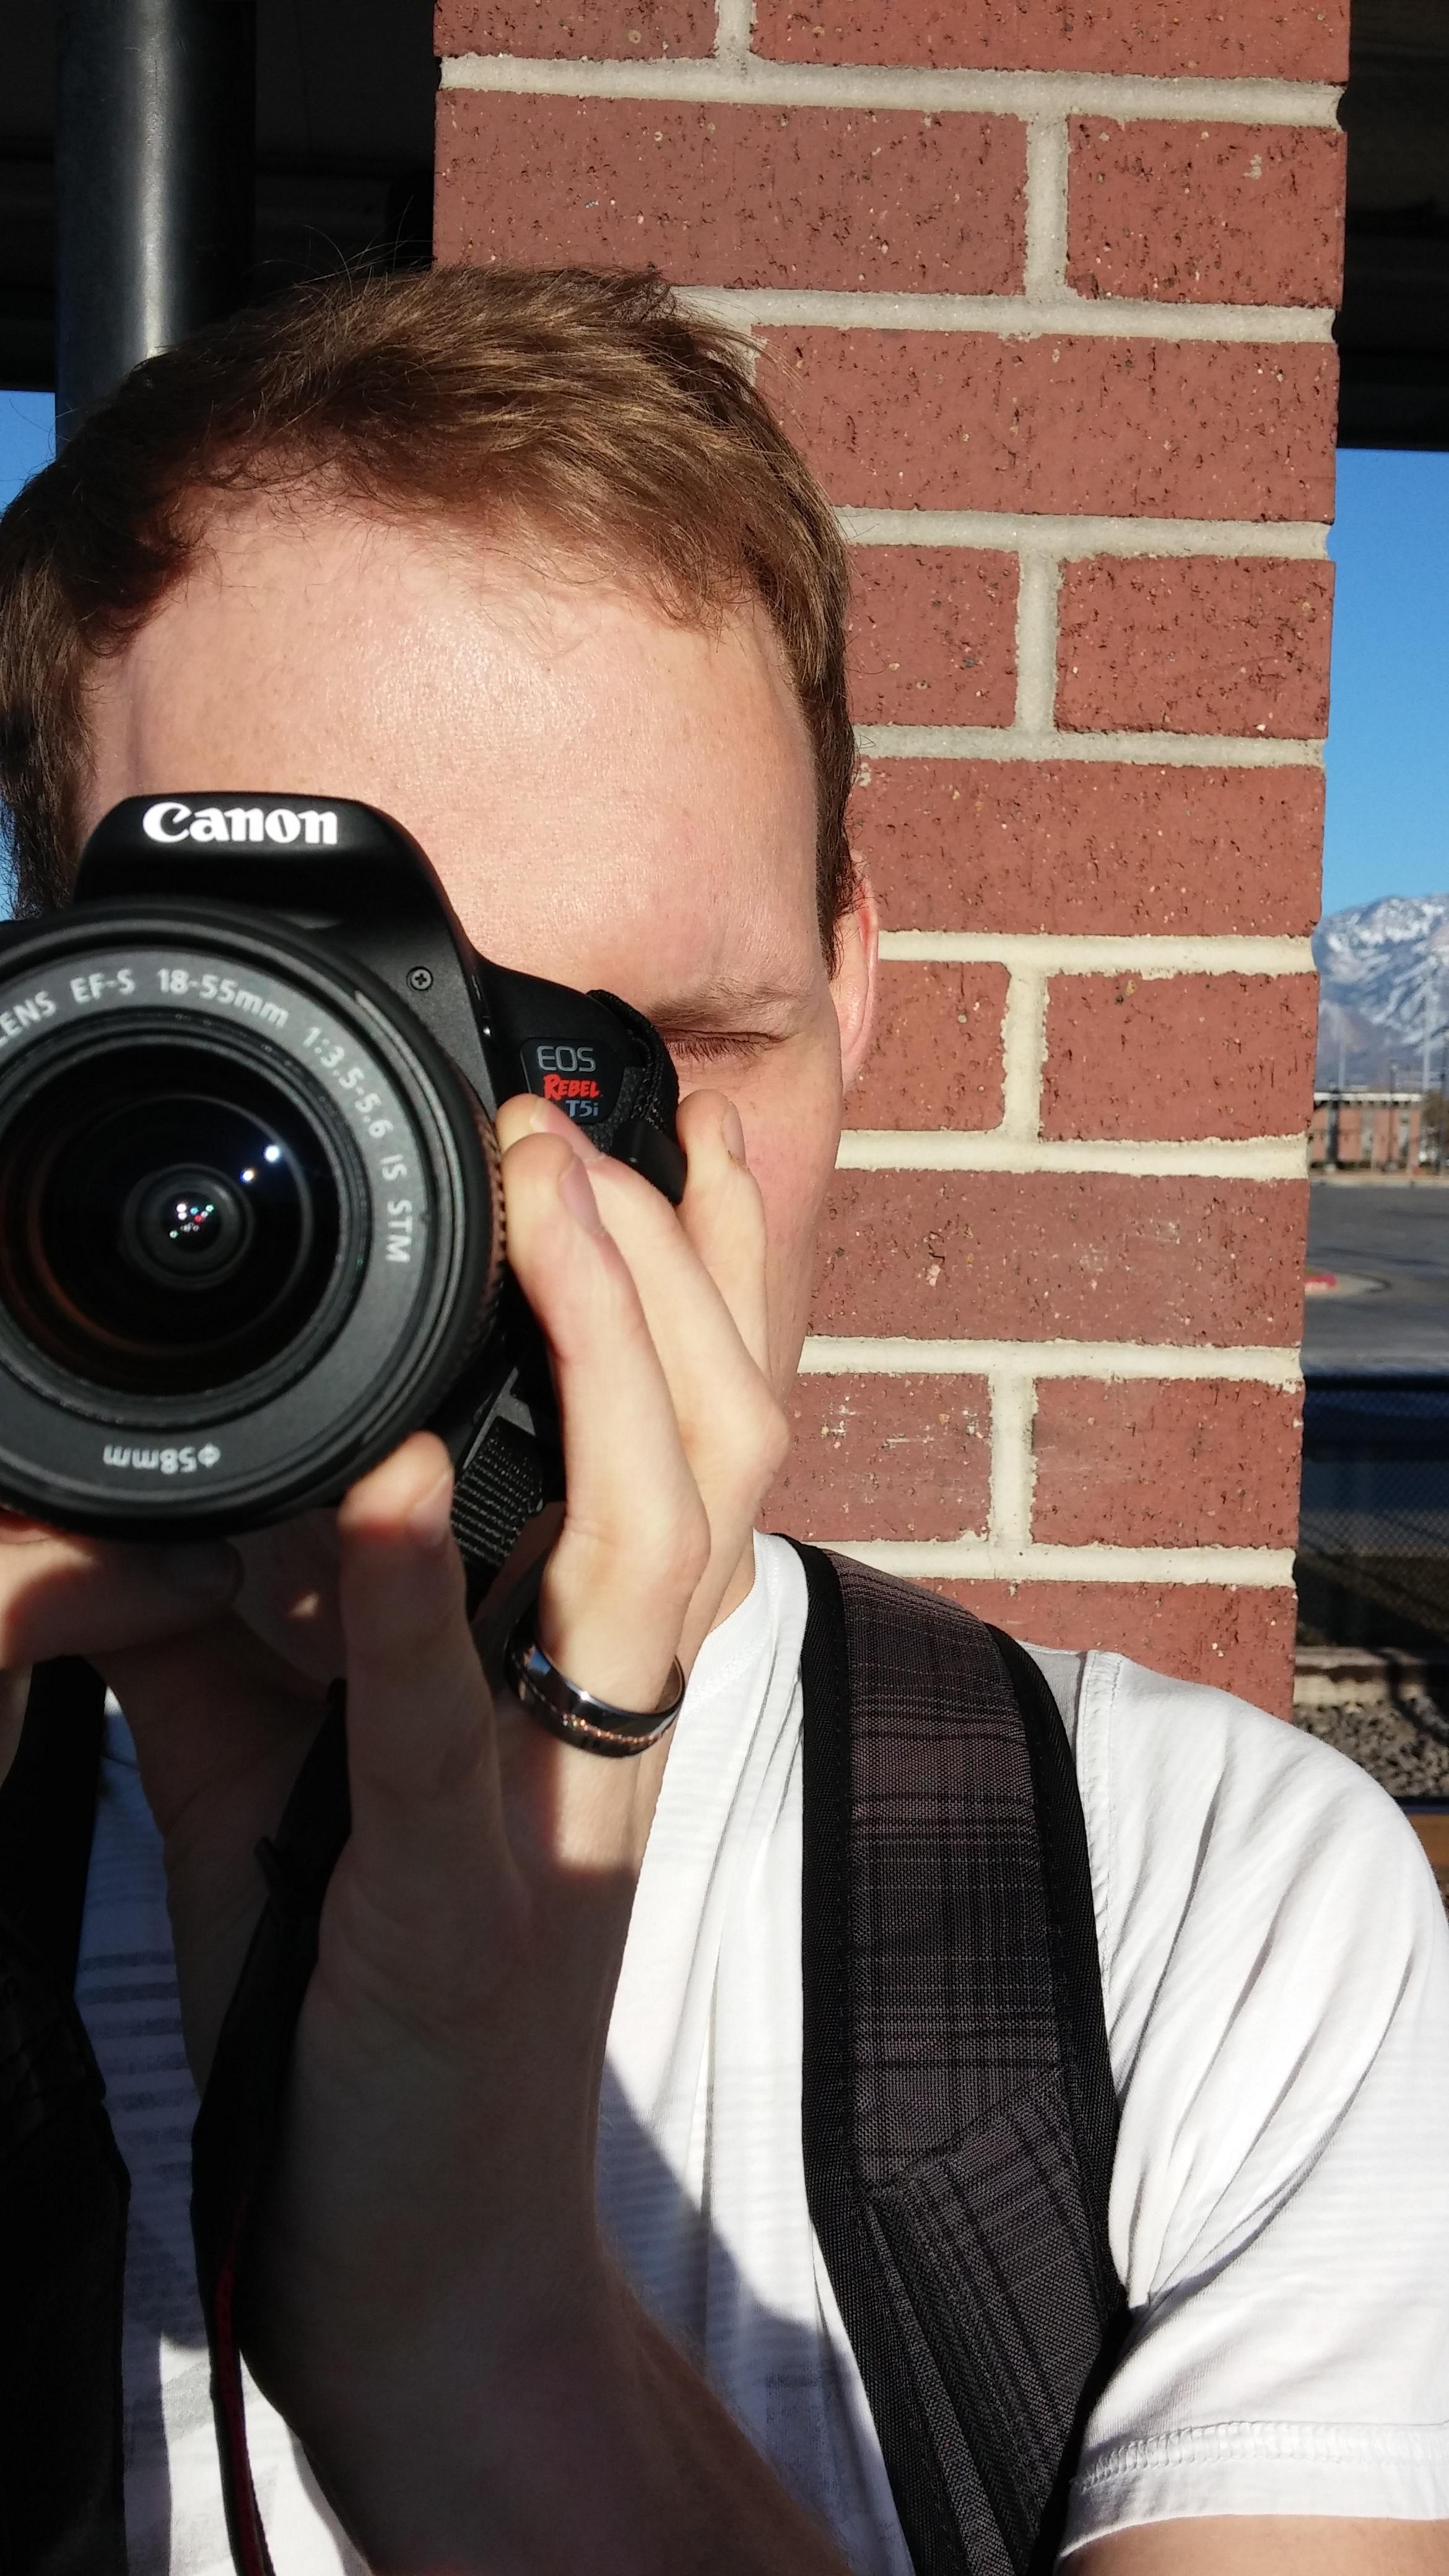 660 Gambar Cowok Keren Pake Kamera Canon Terbaru